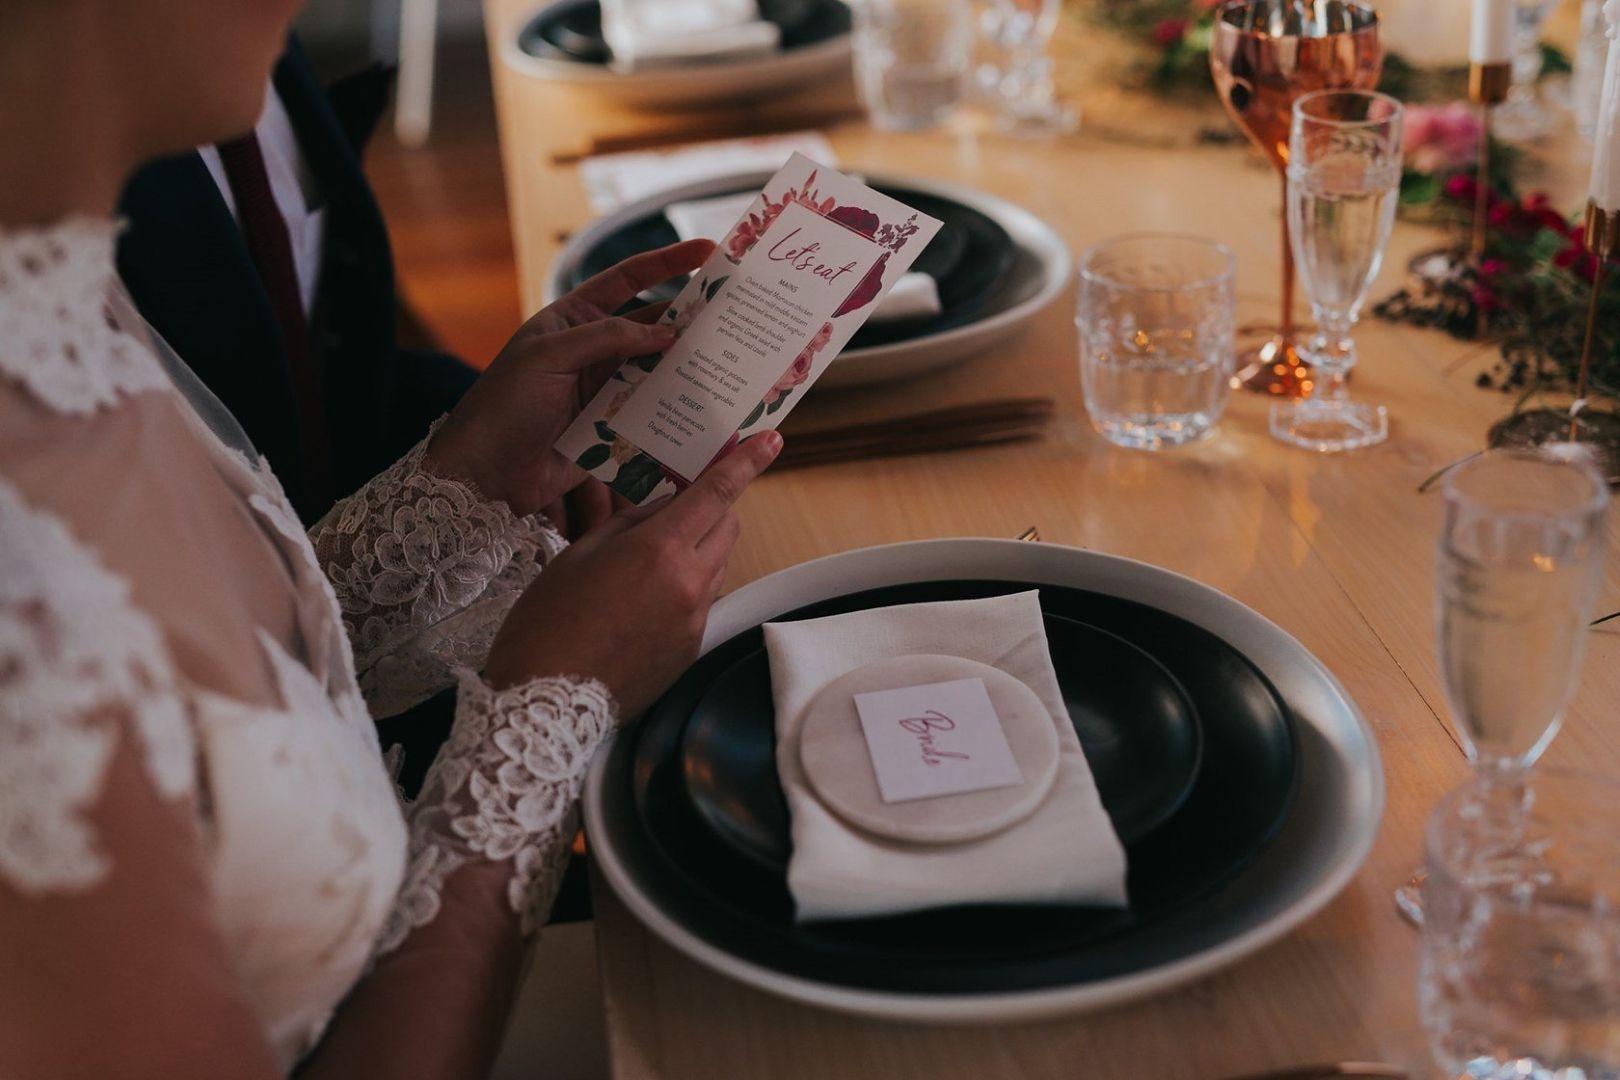 Wedding Venue - Tweed Gallery Cafe 4 on Veilability